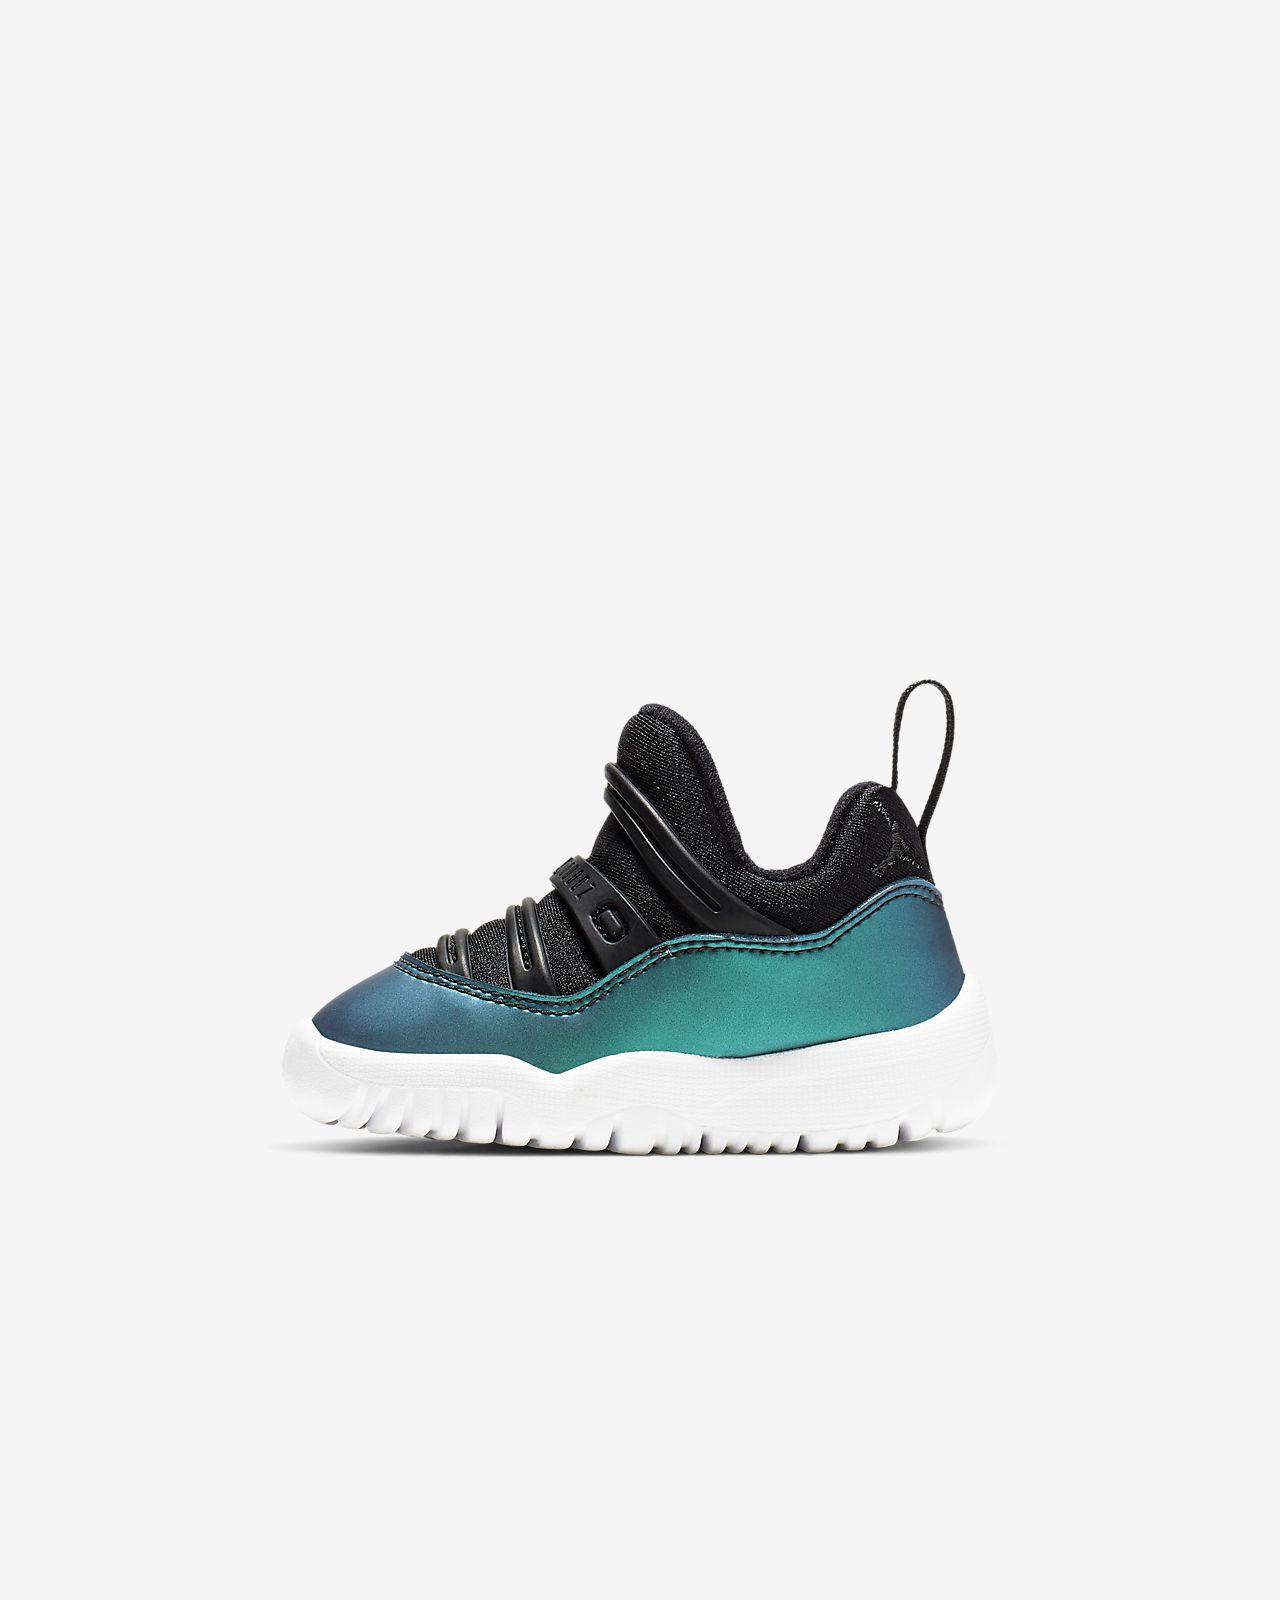 low priced e3df0 5d909 Air Jordan 11 Retro Little Flex Baby/Toddler Shoe